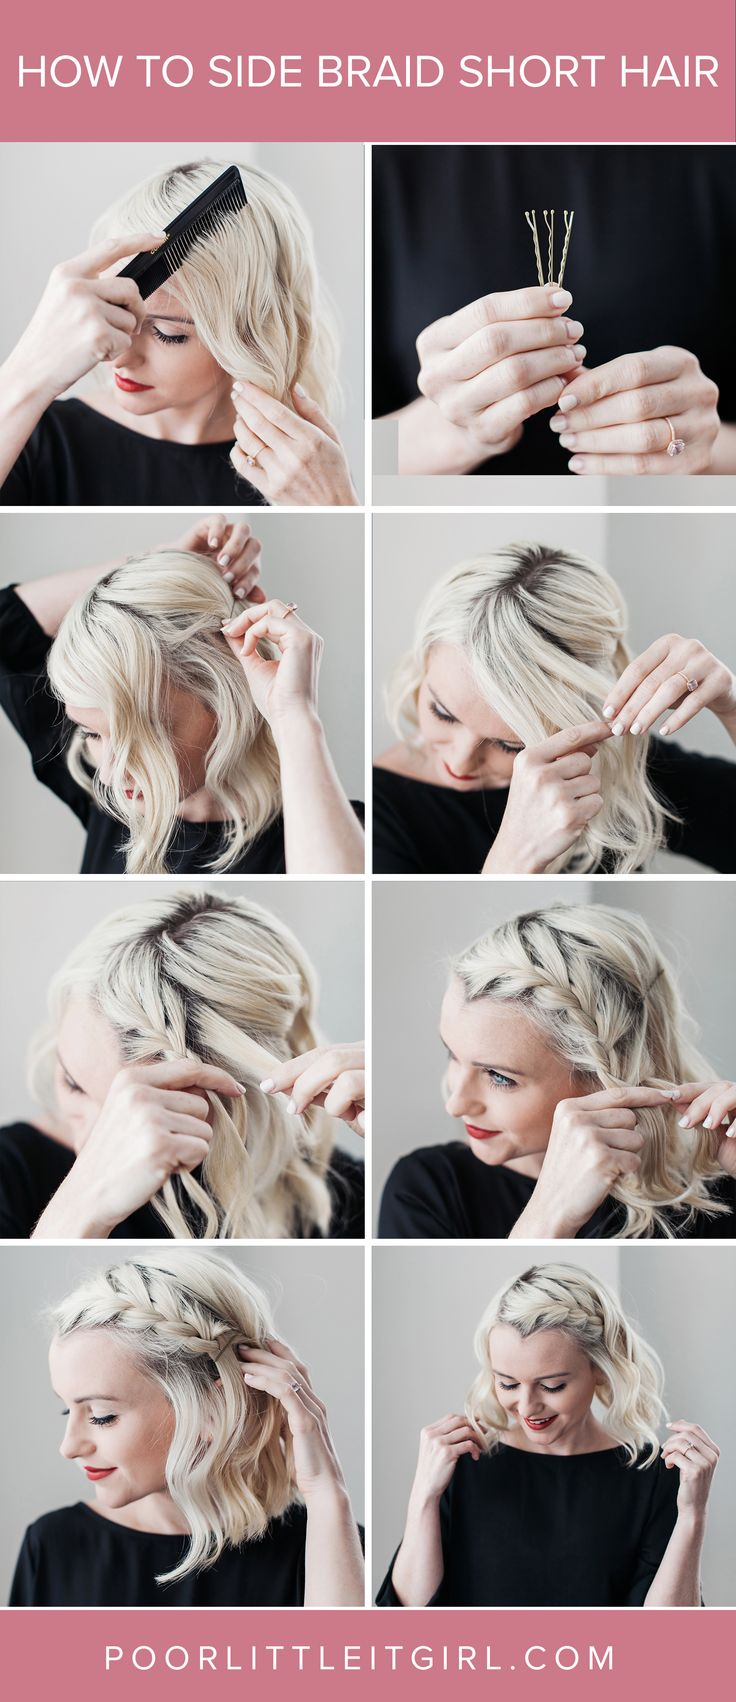 How To Side Braid Short Hair - Hair Tutorial - Braid - Poor Little It Girl